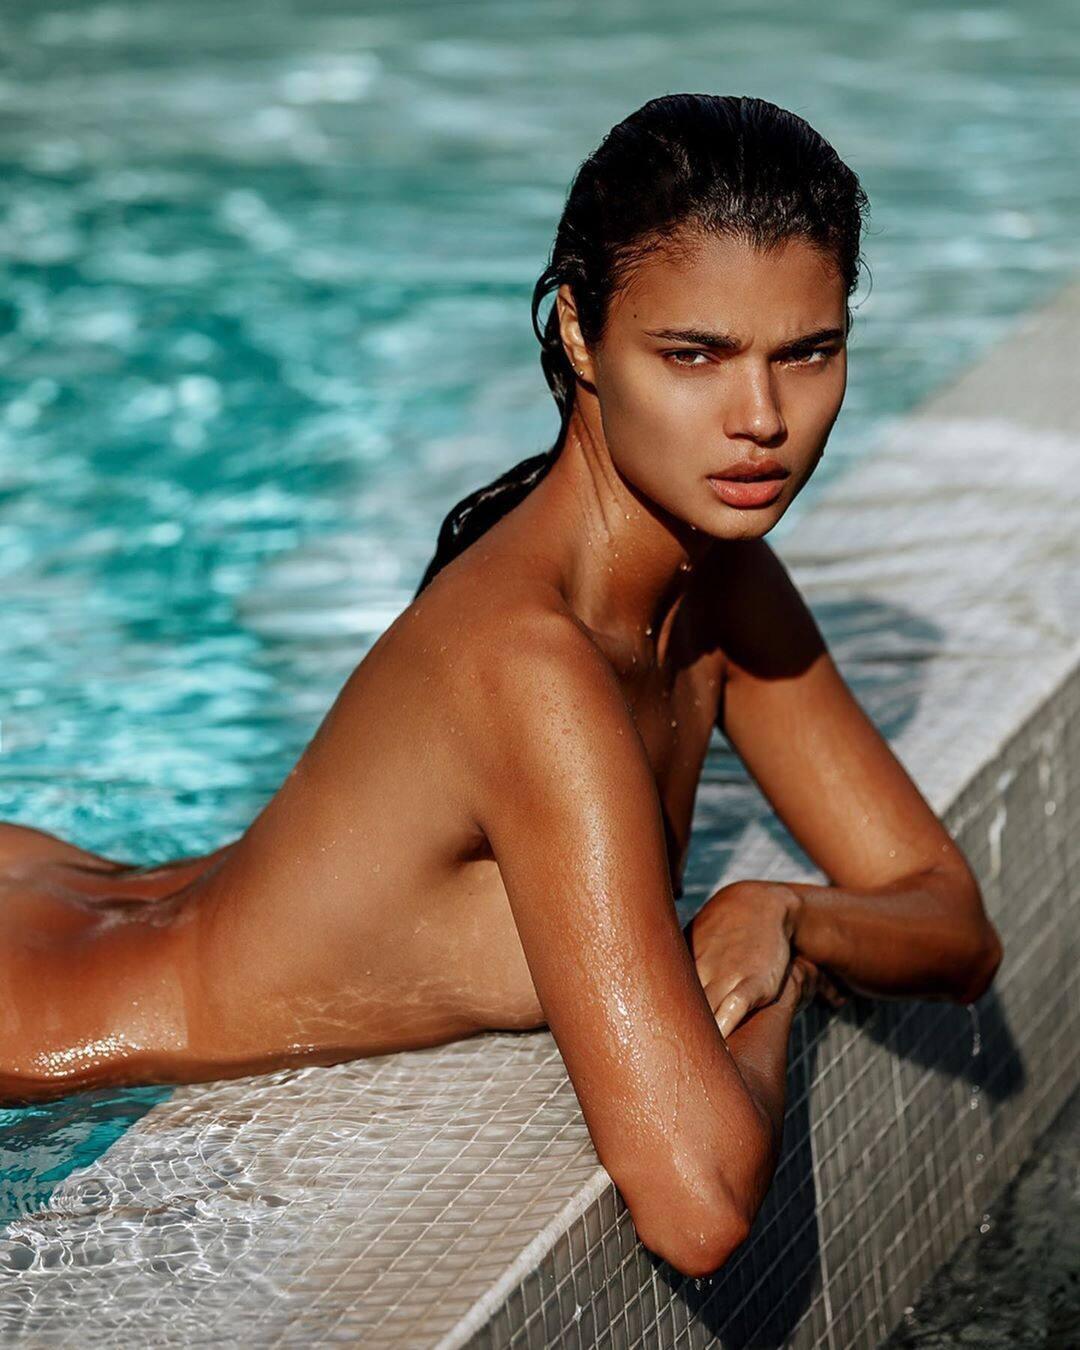 Daniela Braga – Hot Body In Sexy Instagram Pics 0005